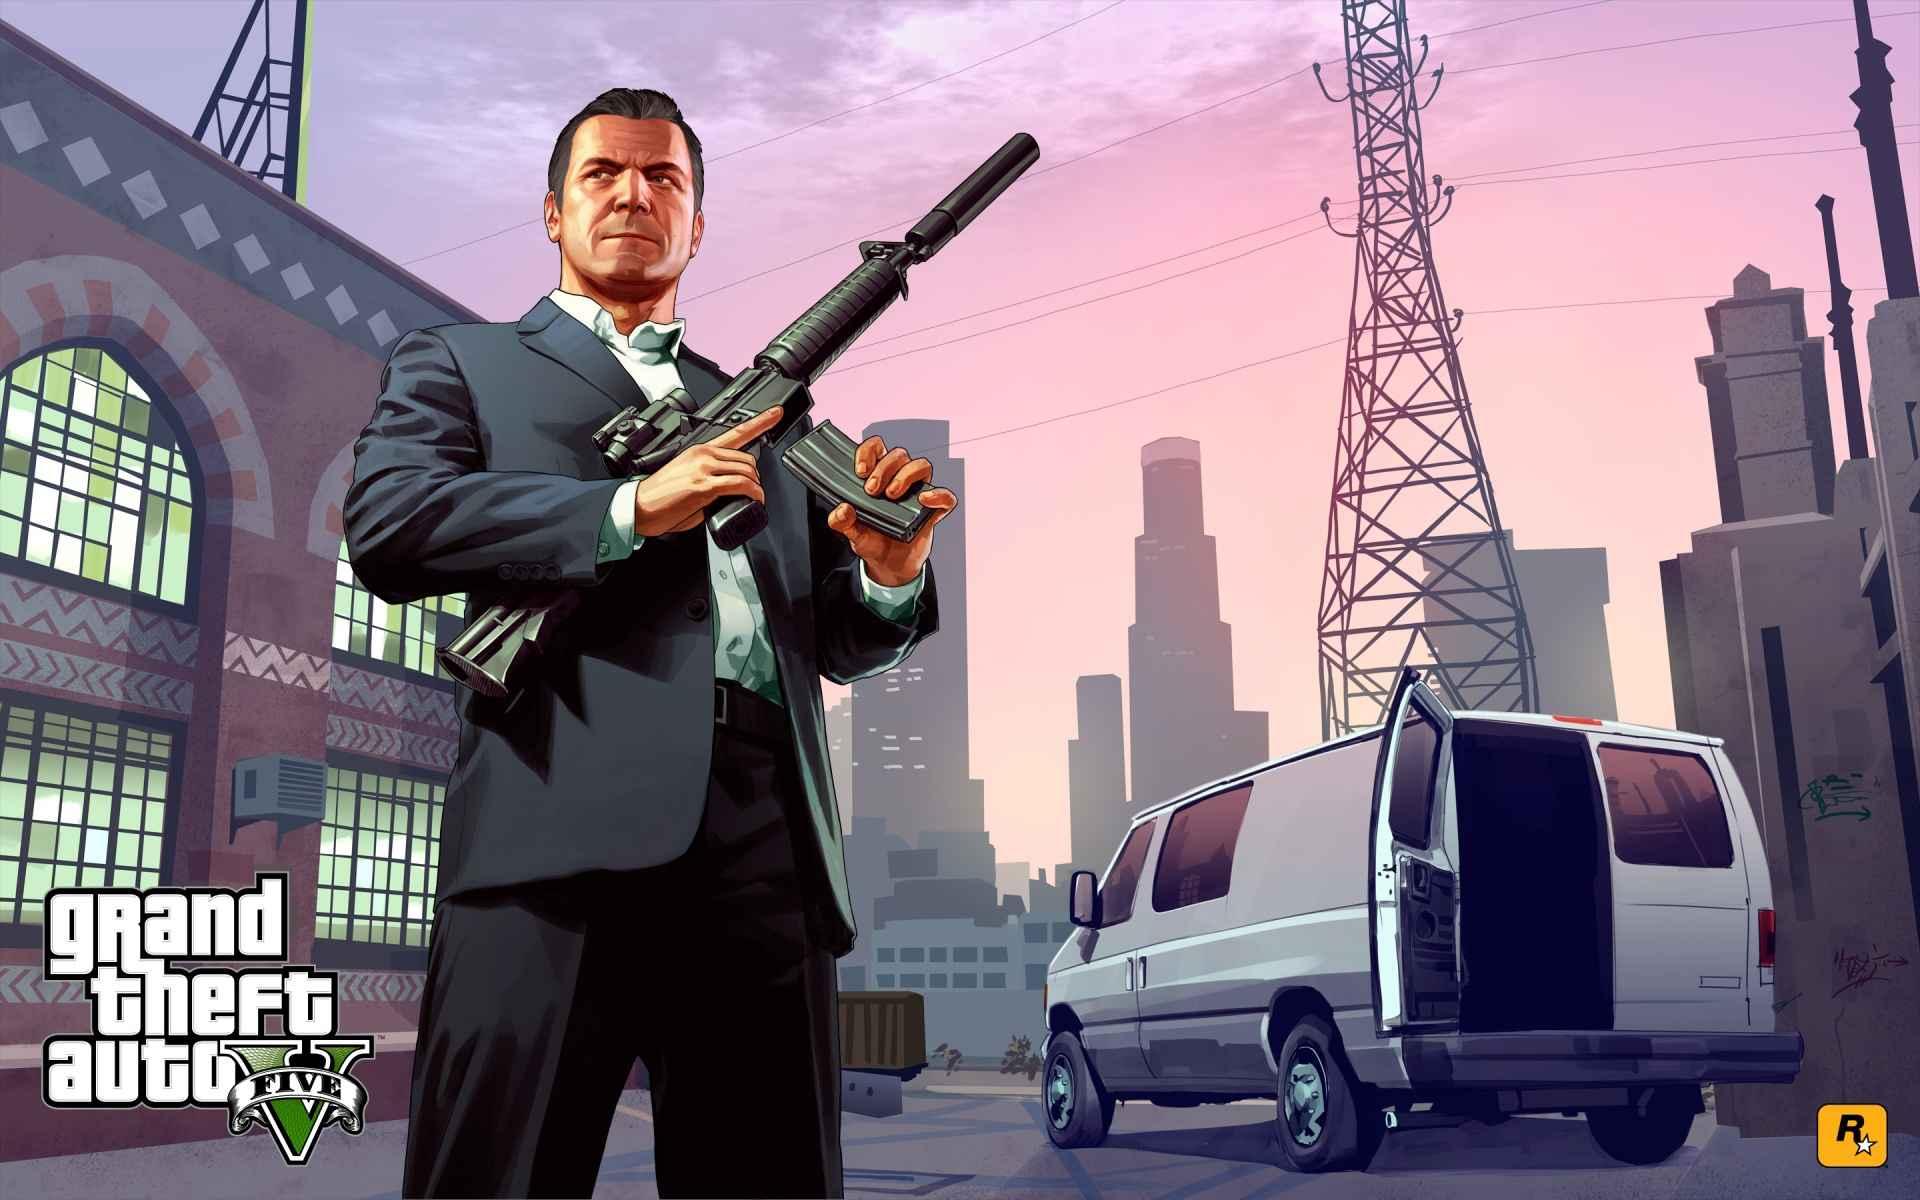 Game Grand Theft Auto V Wallpaper 053